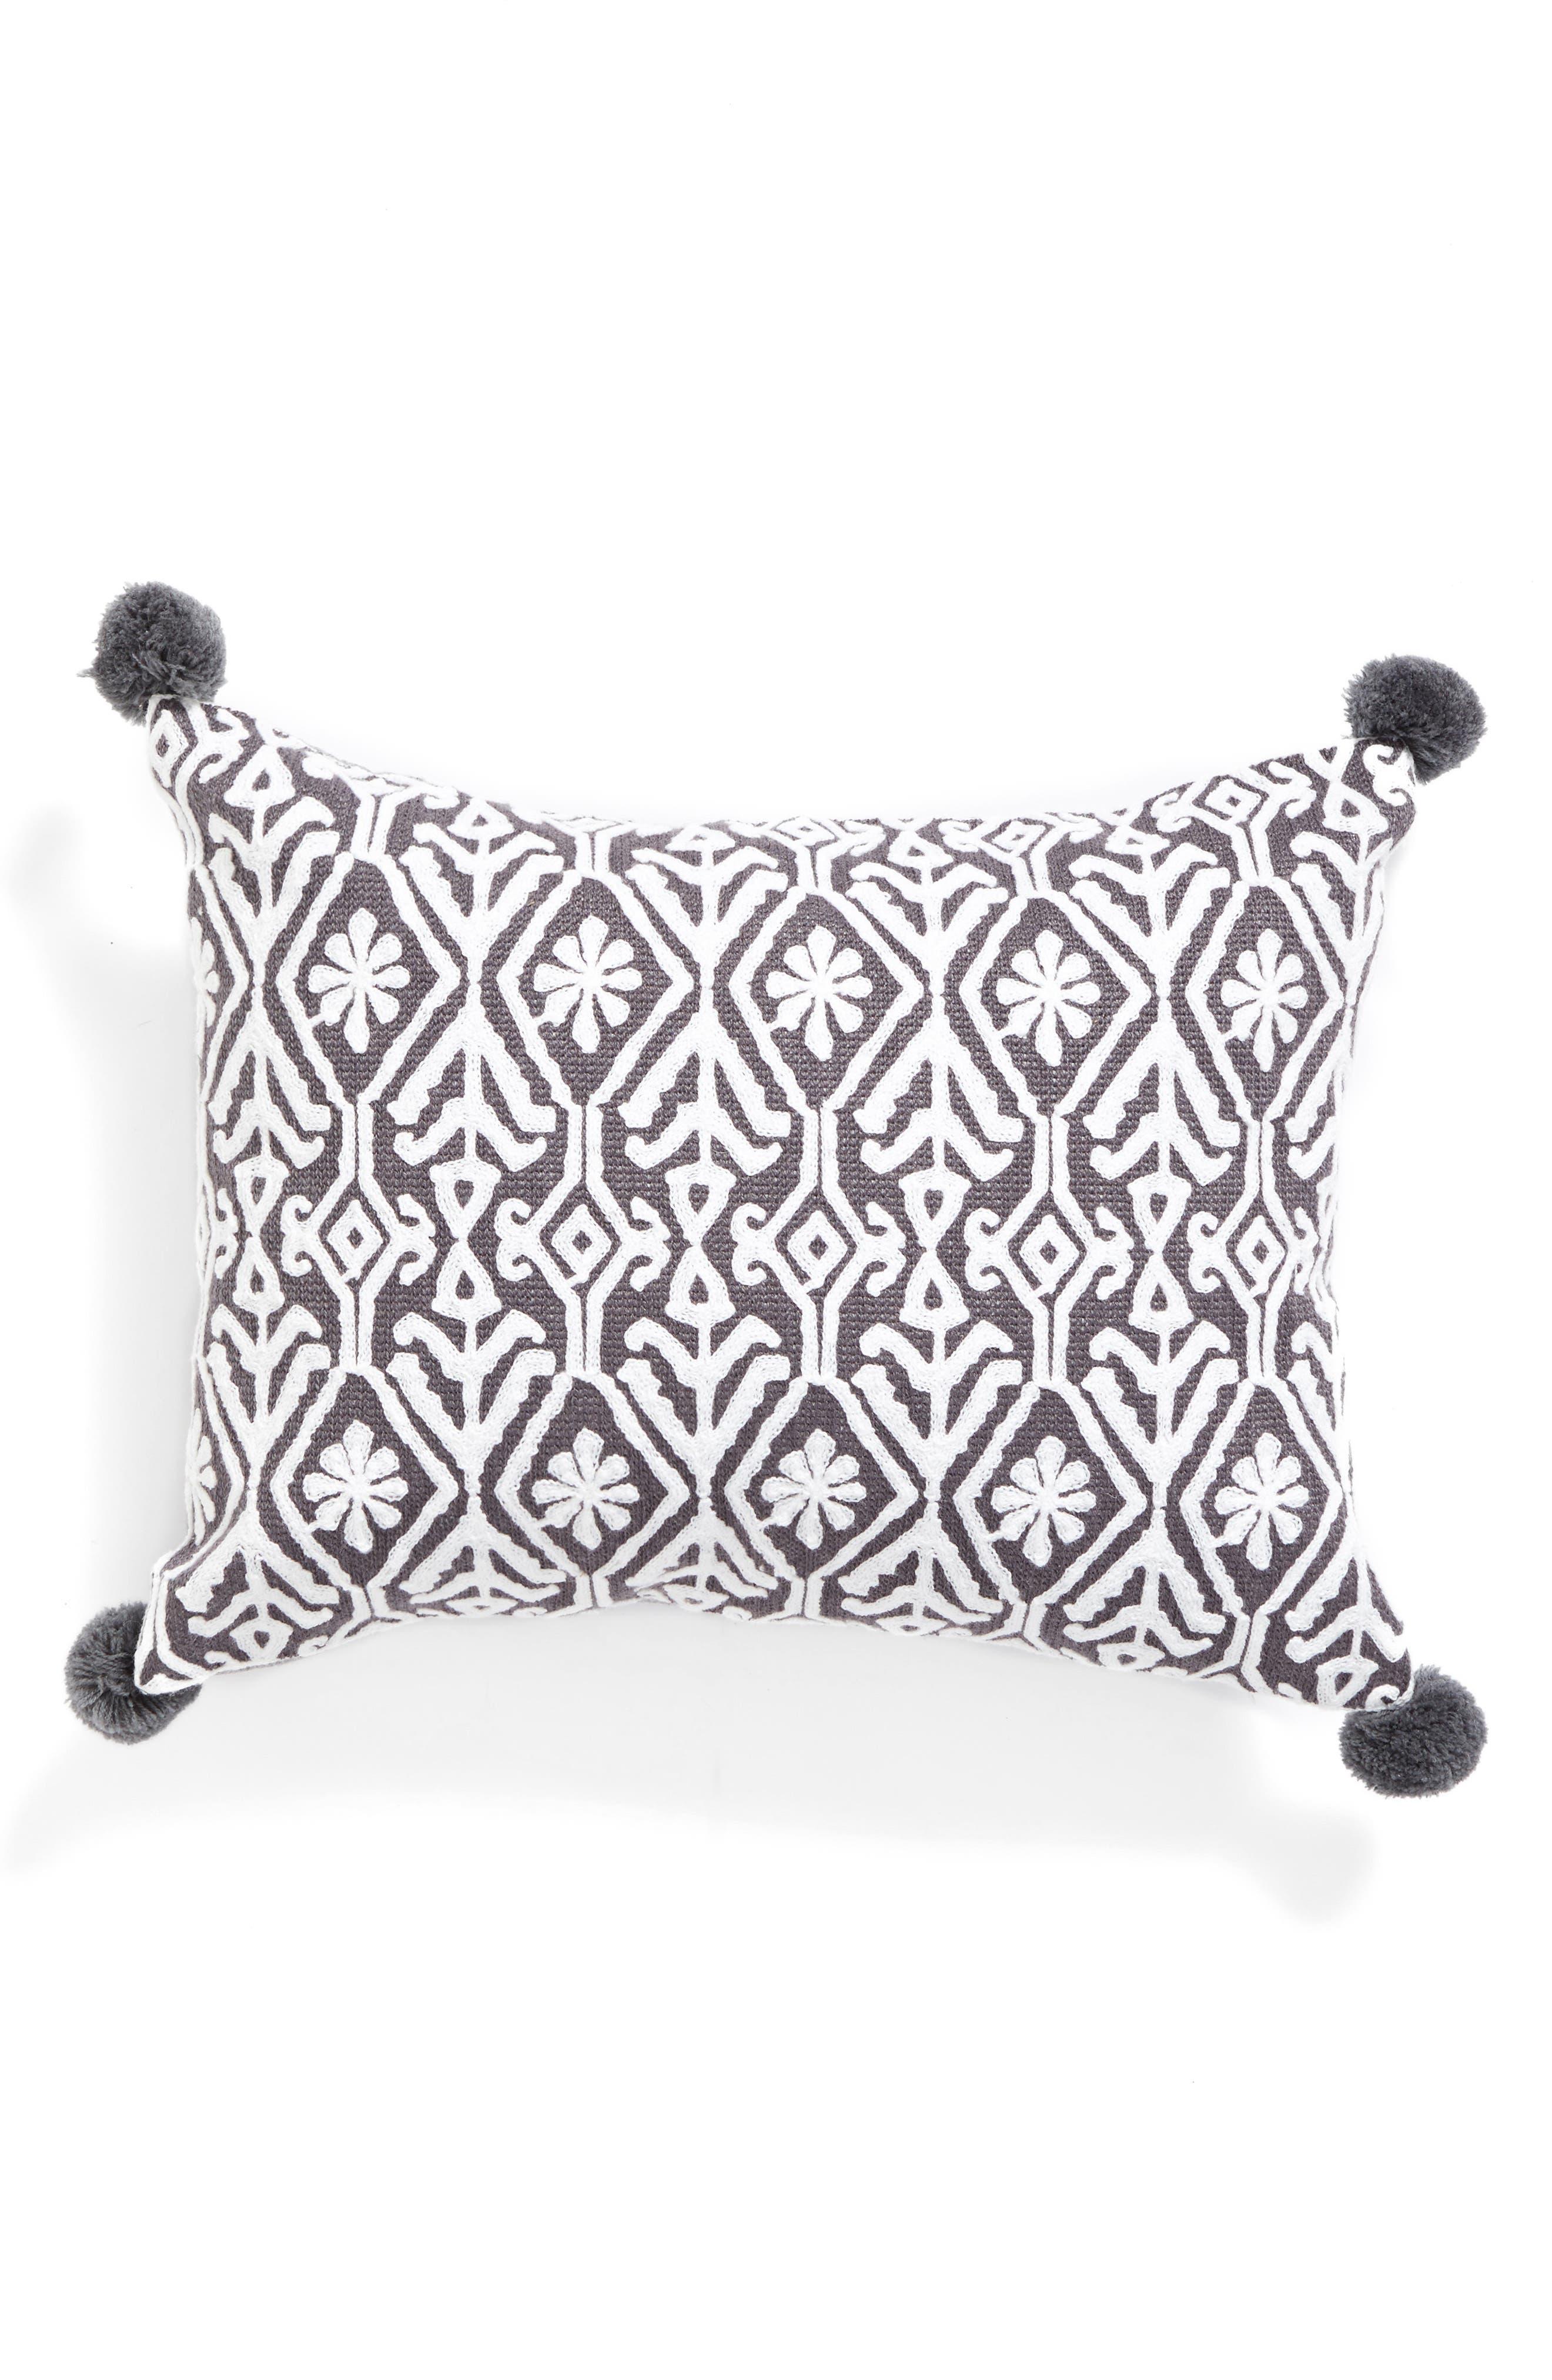 Levtex Avanti Towel Stitch Accent Pillow